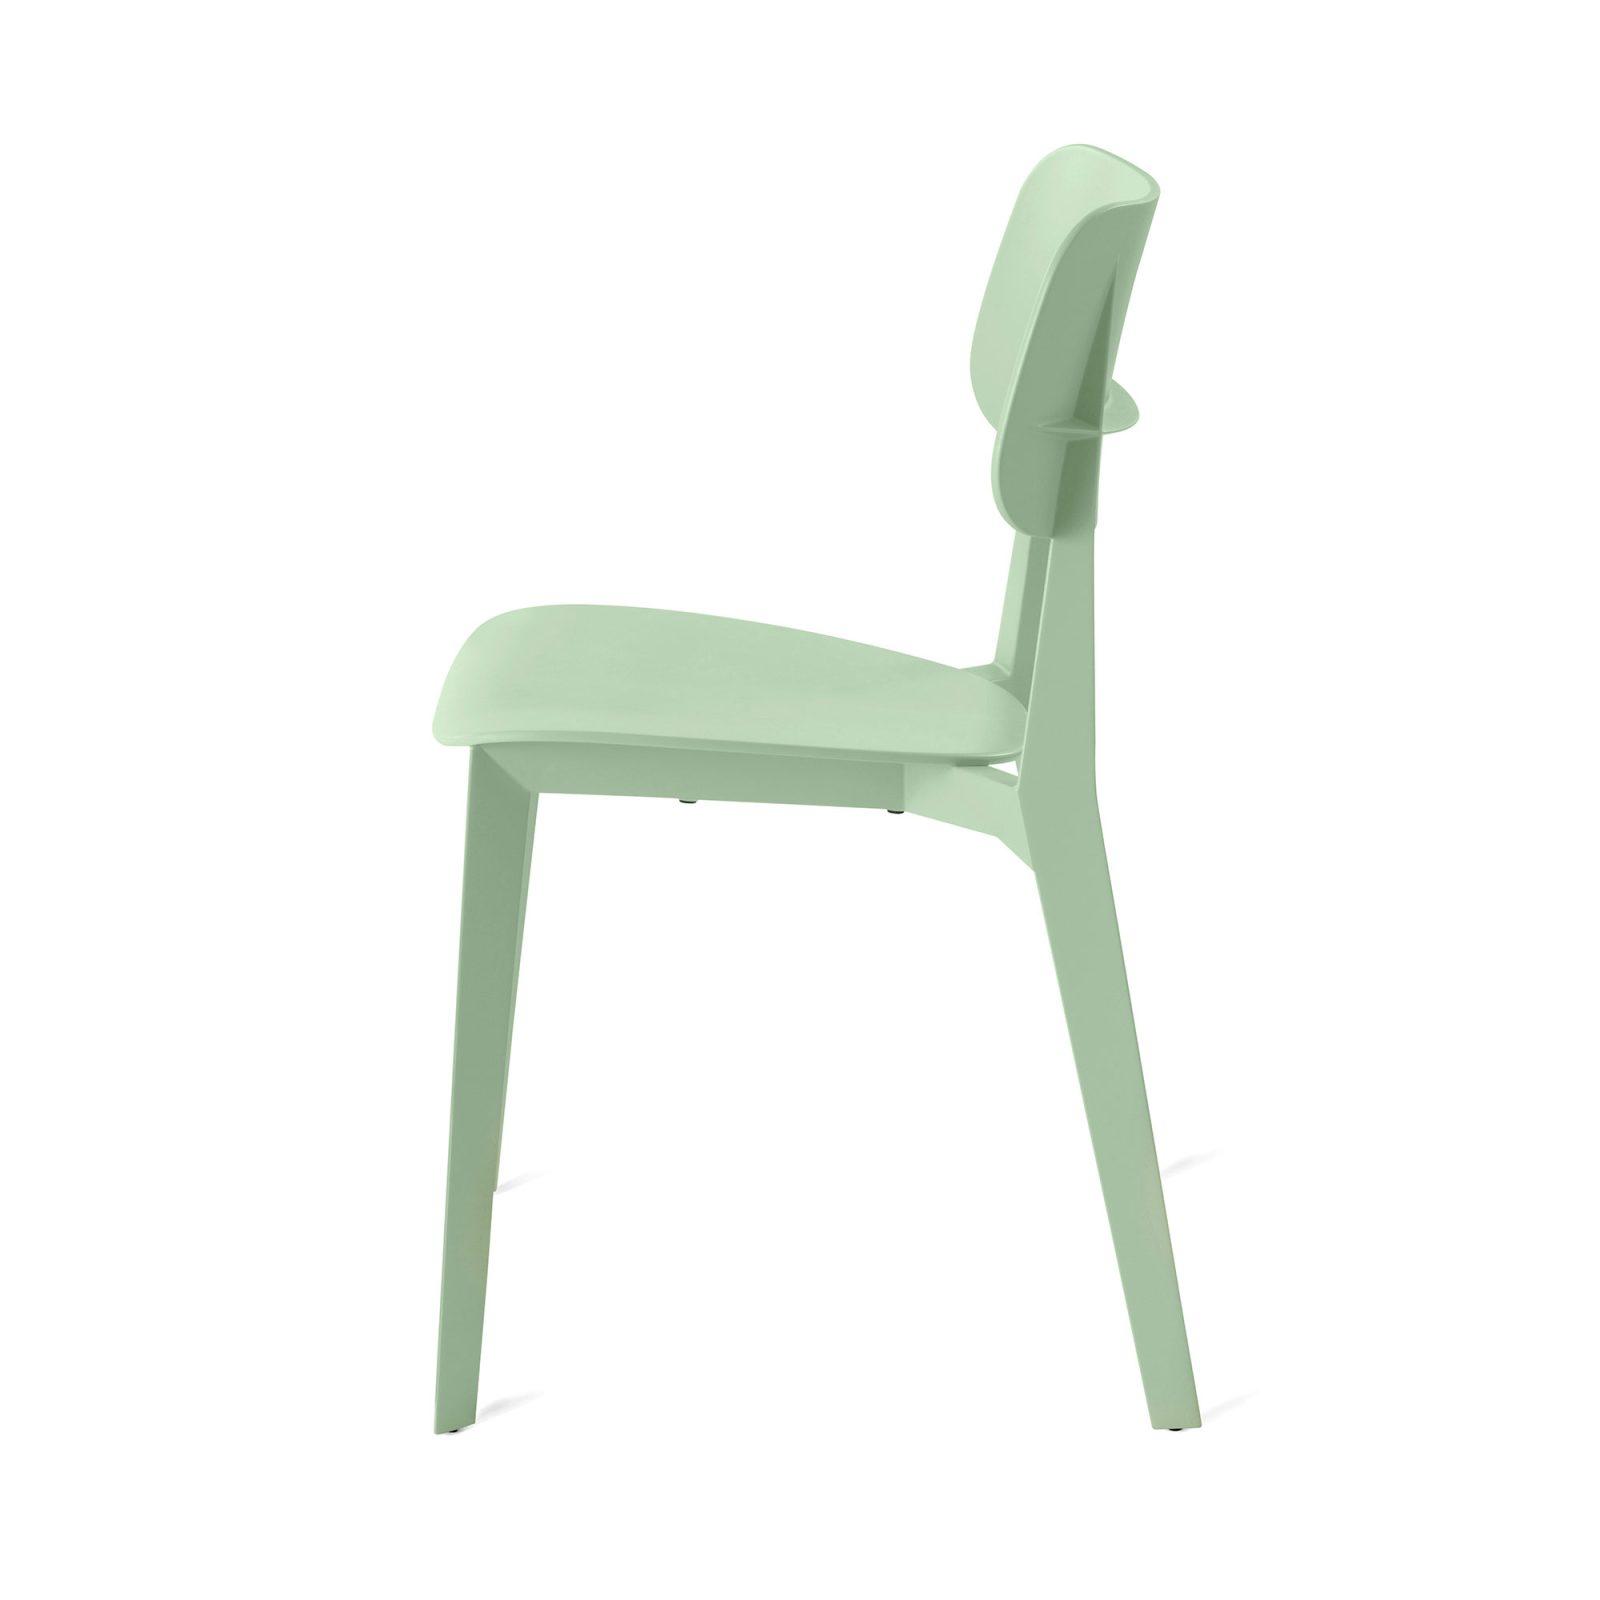 stellar-chair-mint-green-9